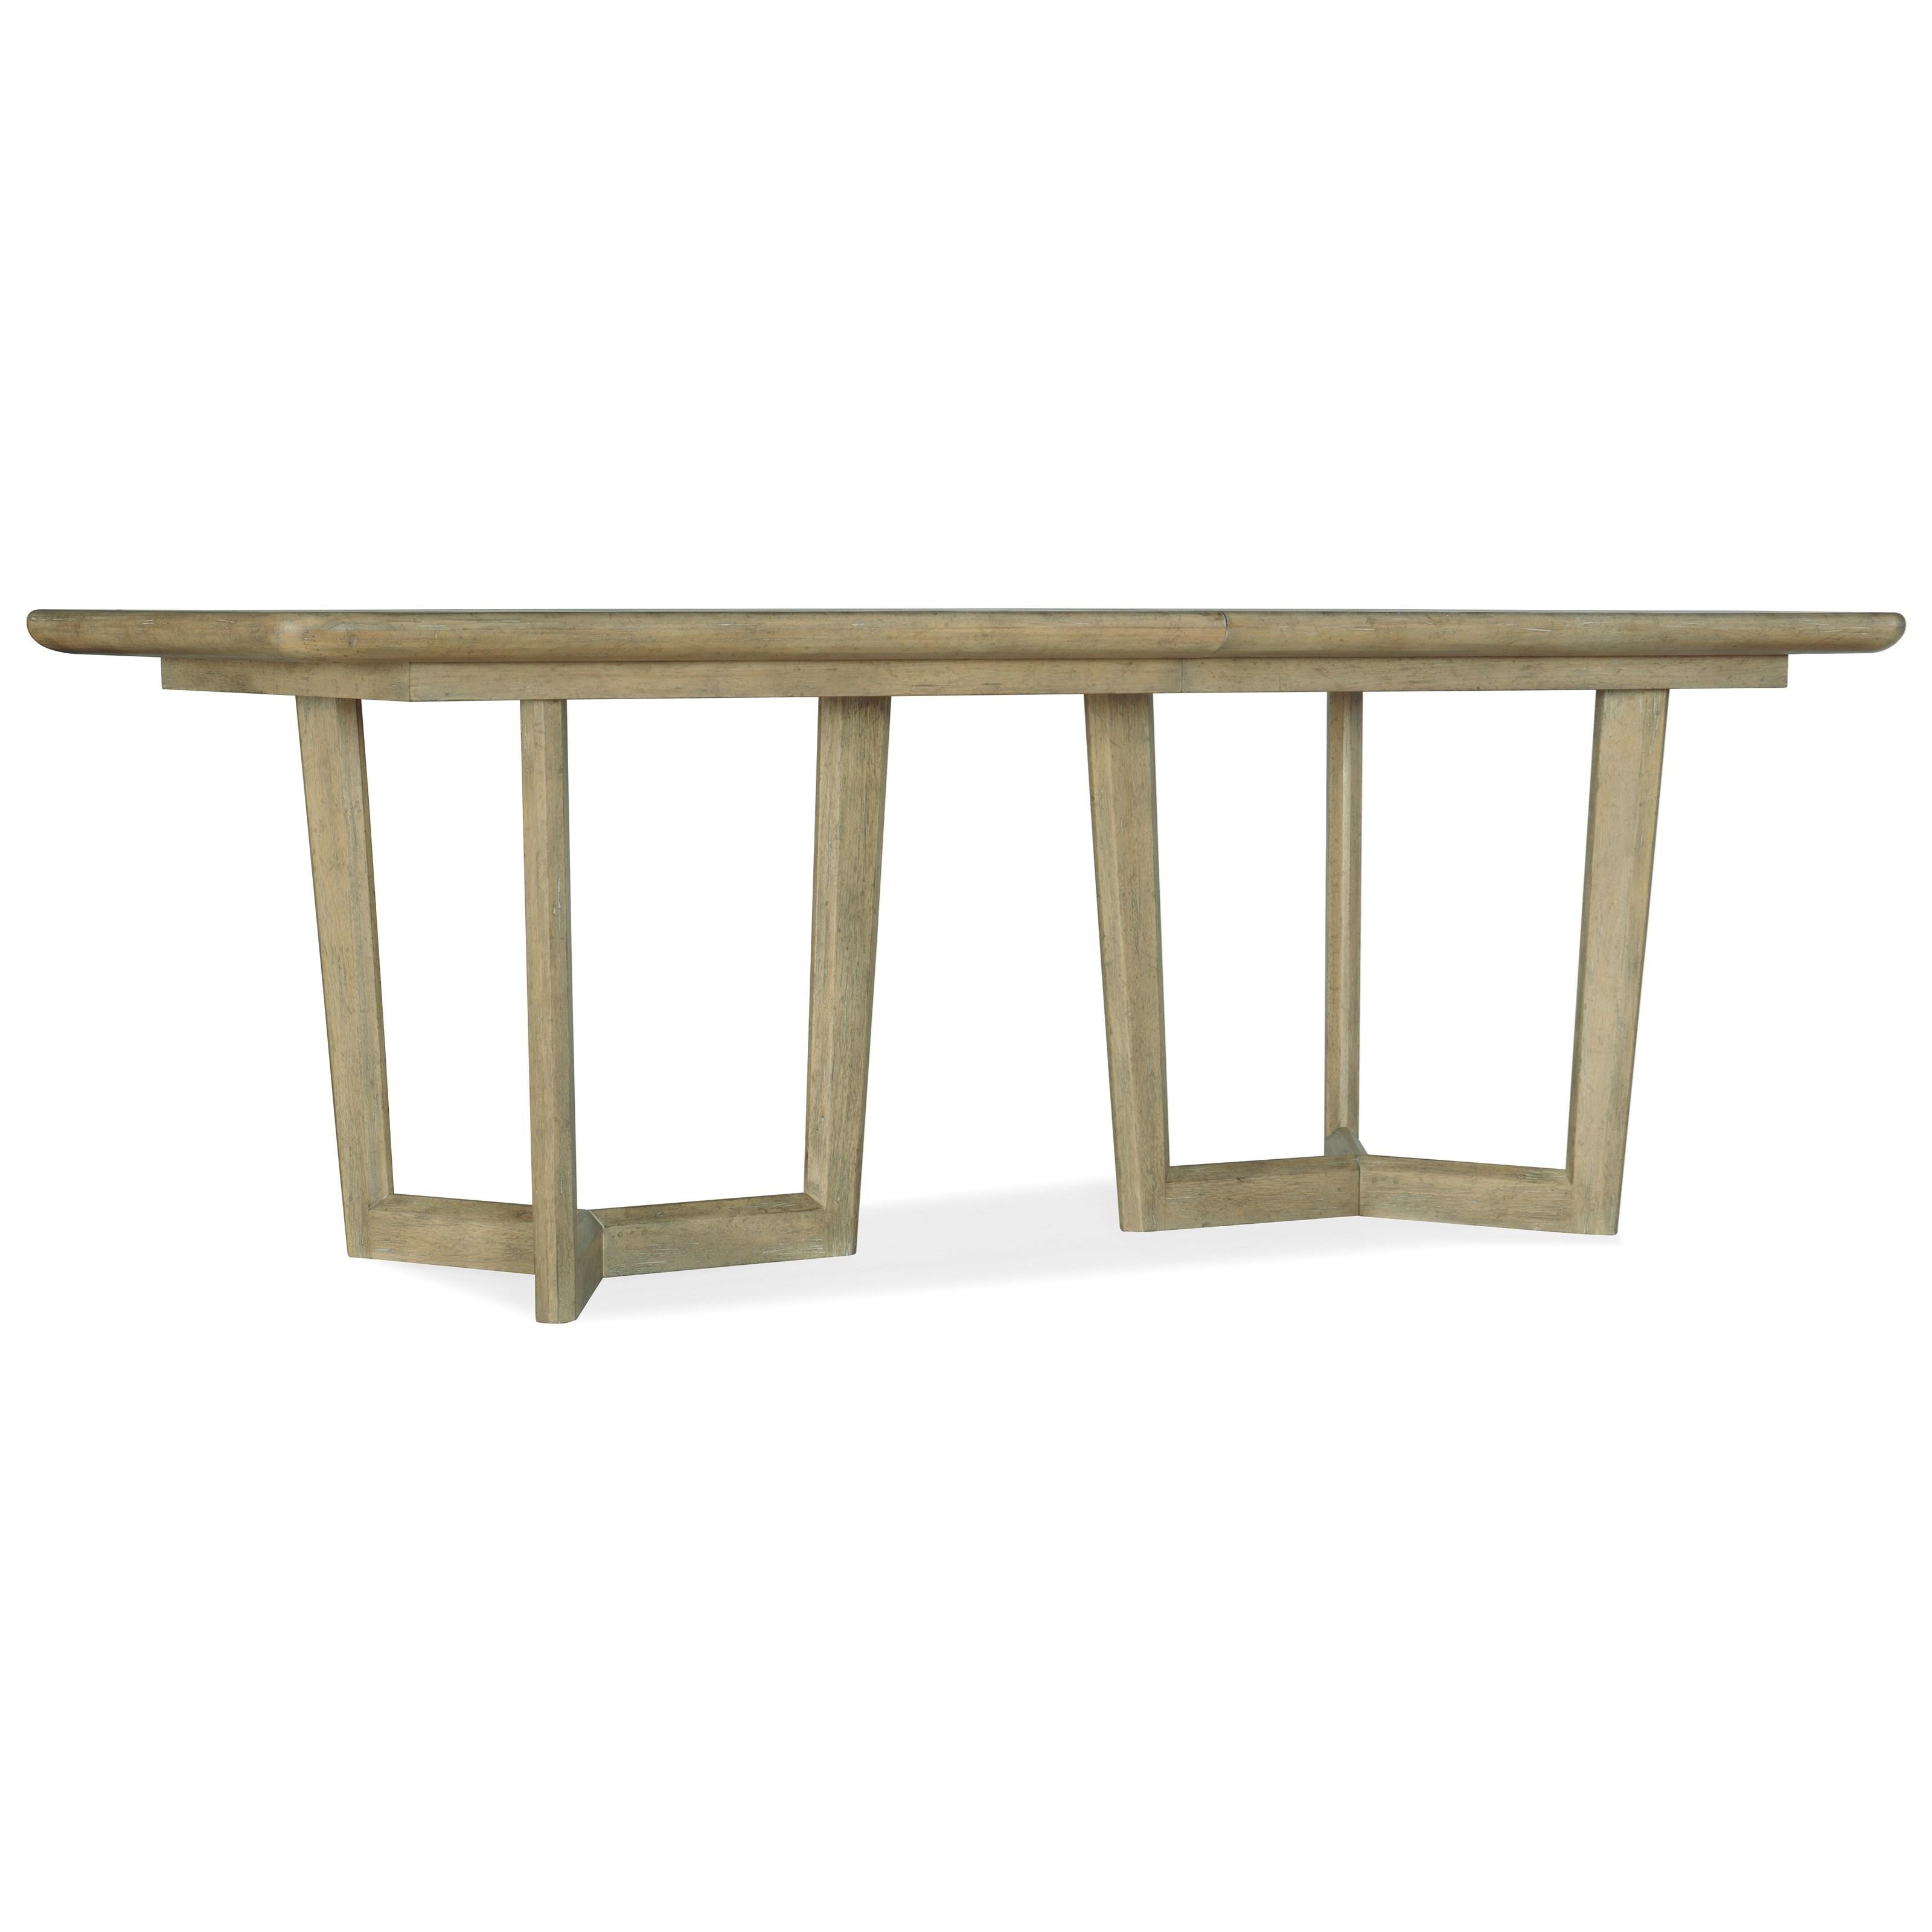 Surfrider Rectangle Dining Table by Hooker Furniture at Baer's Furniture